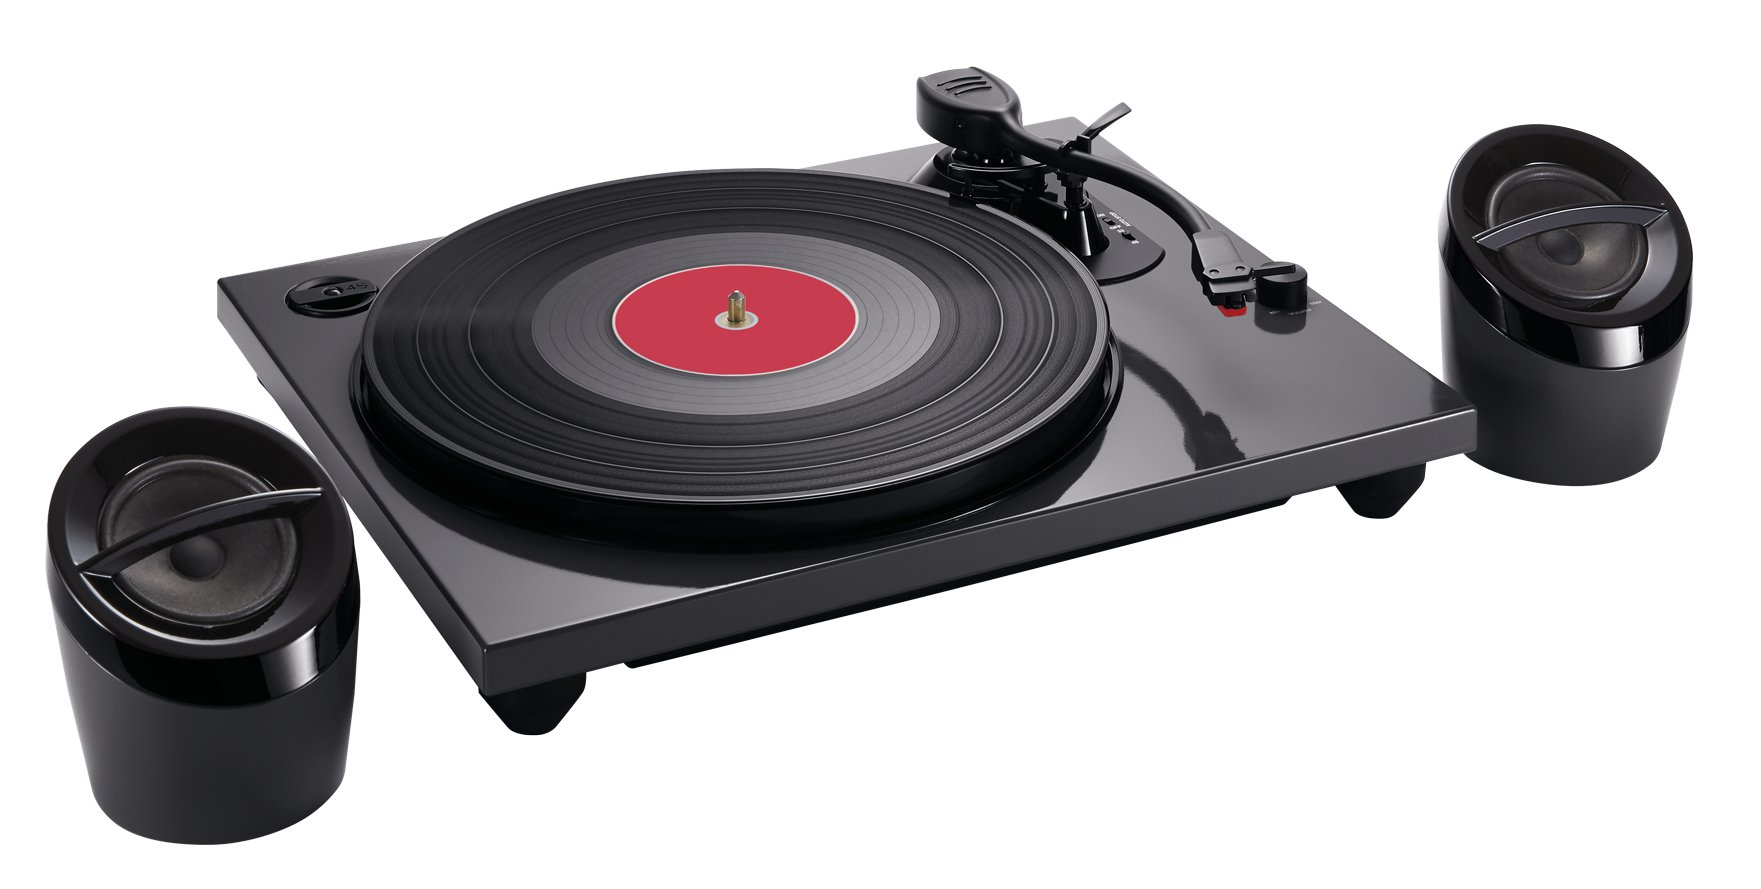 Bigben TD114NSPS - Tocadiscos, Color Negro: Amazon.es: Electrónica